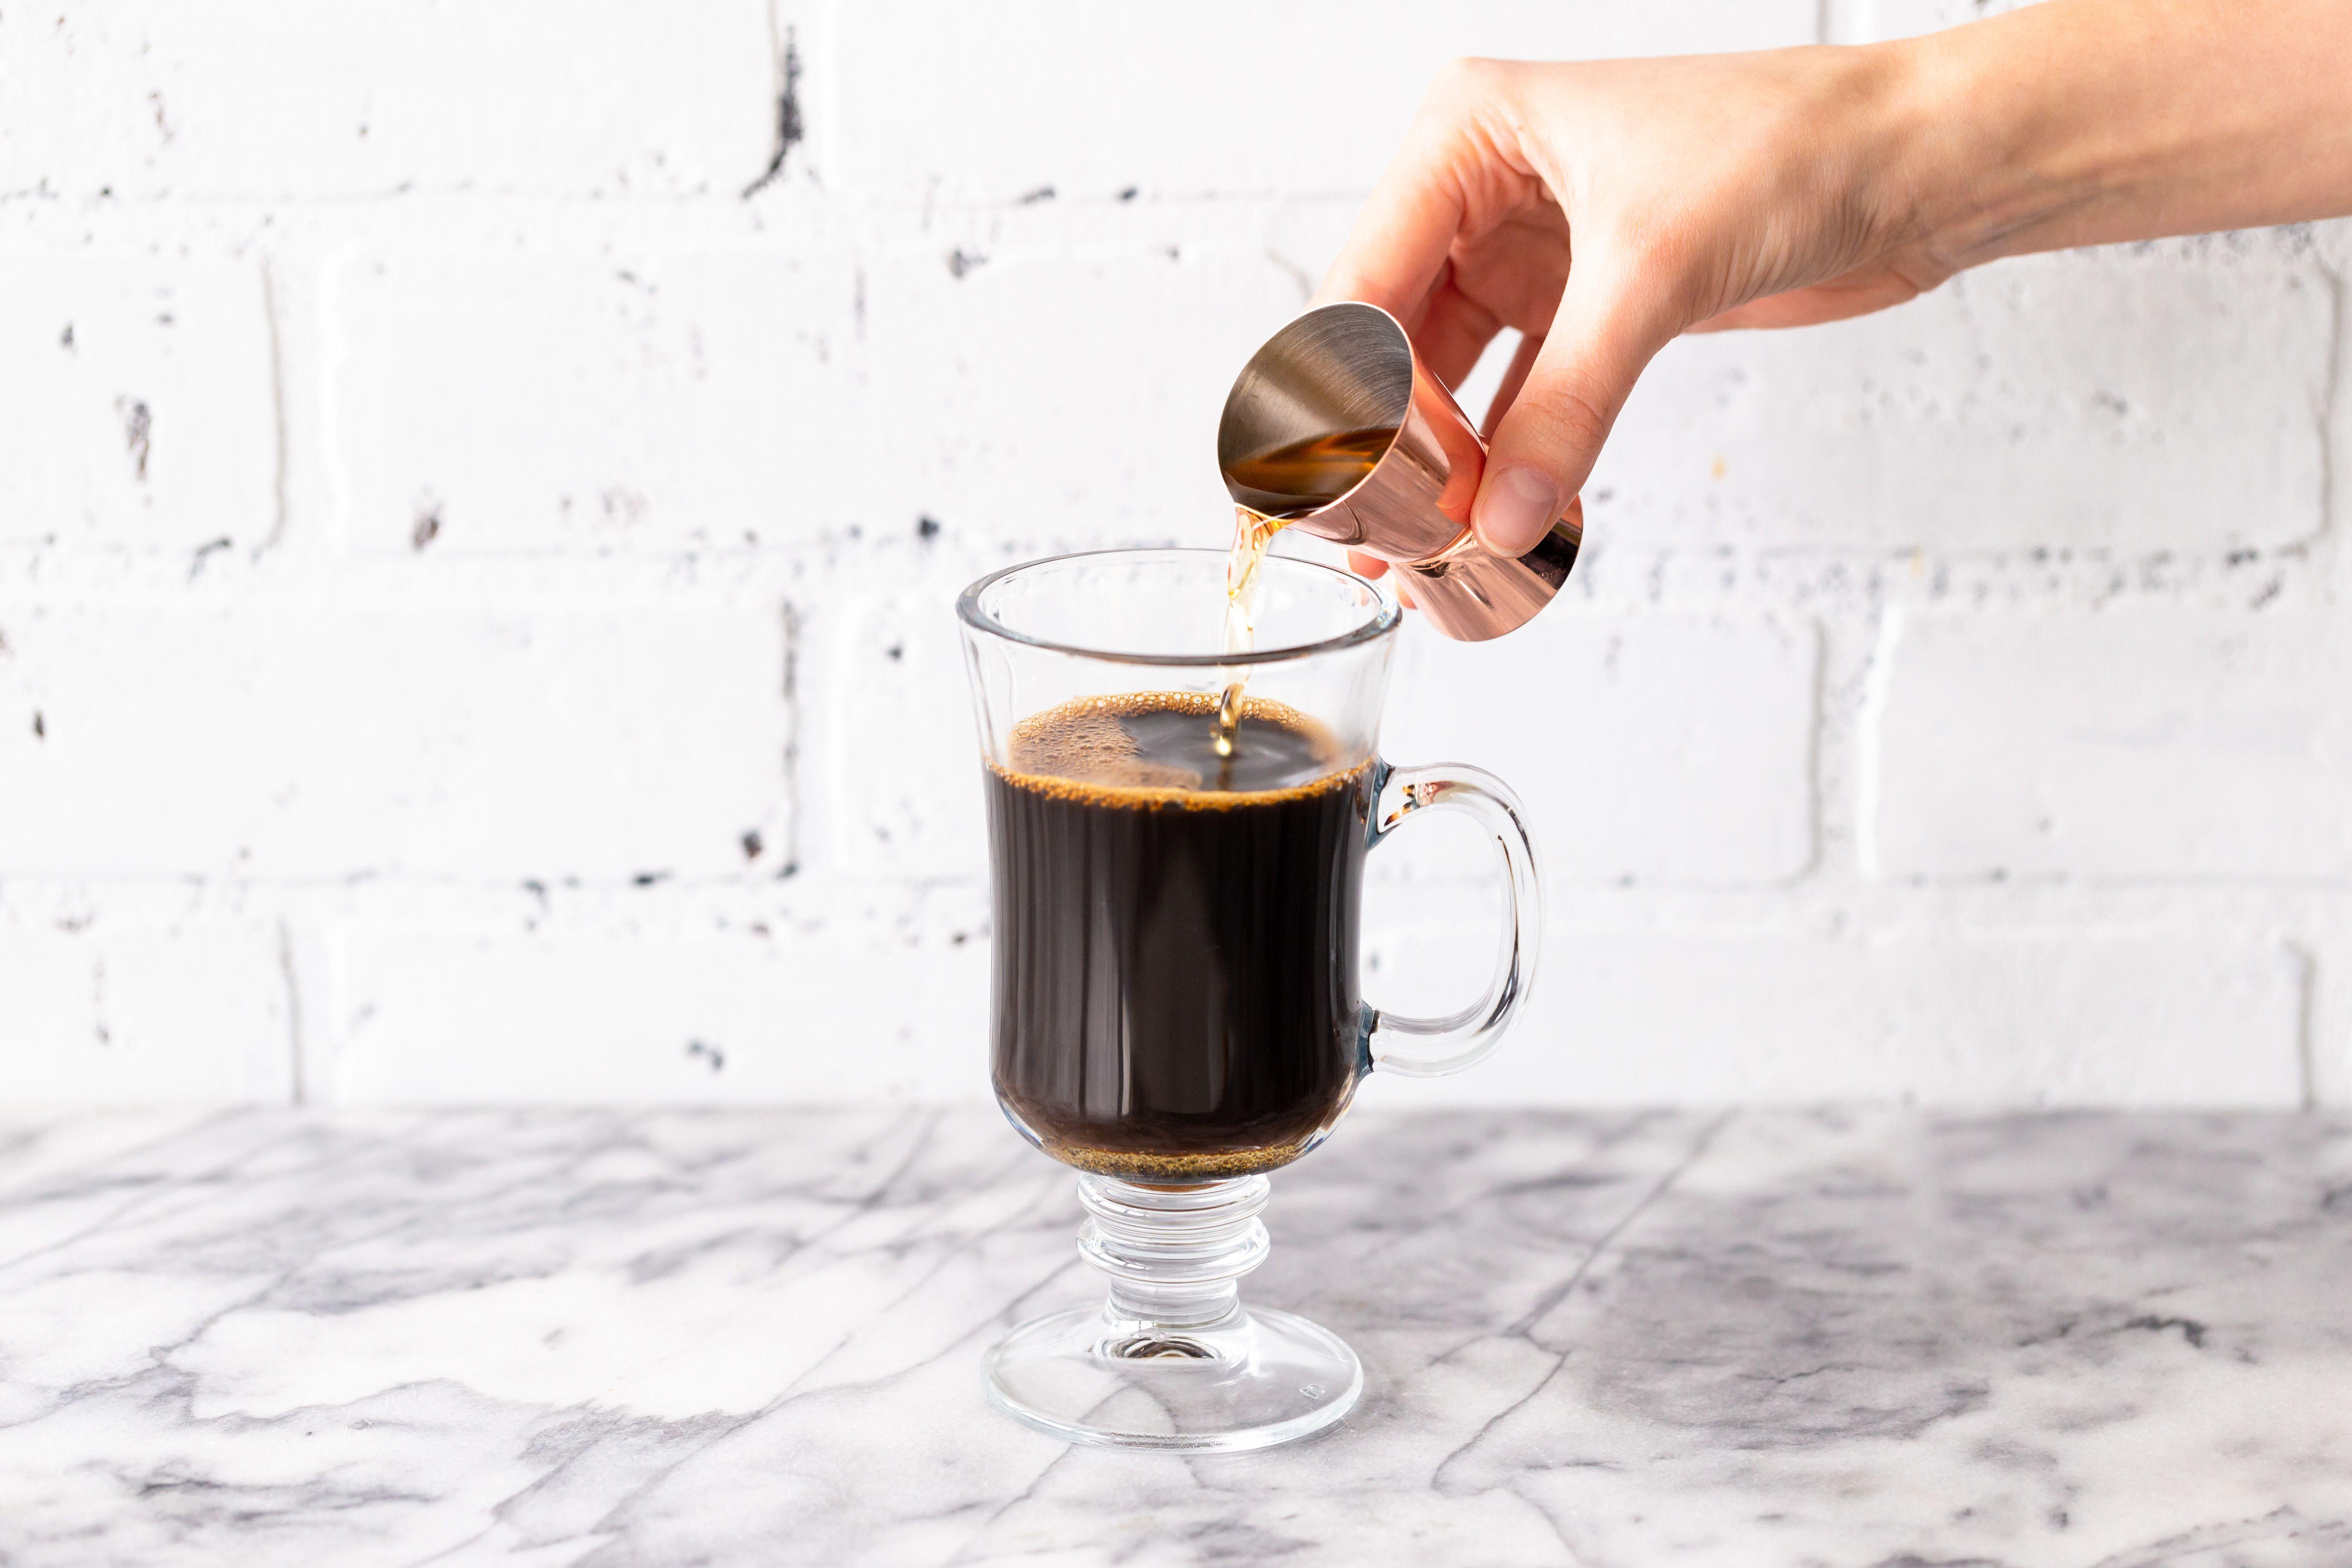 Add the Irish whiskey to the coffee